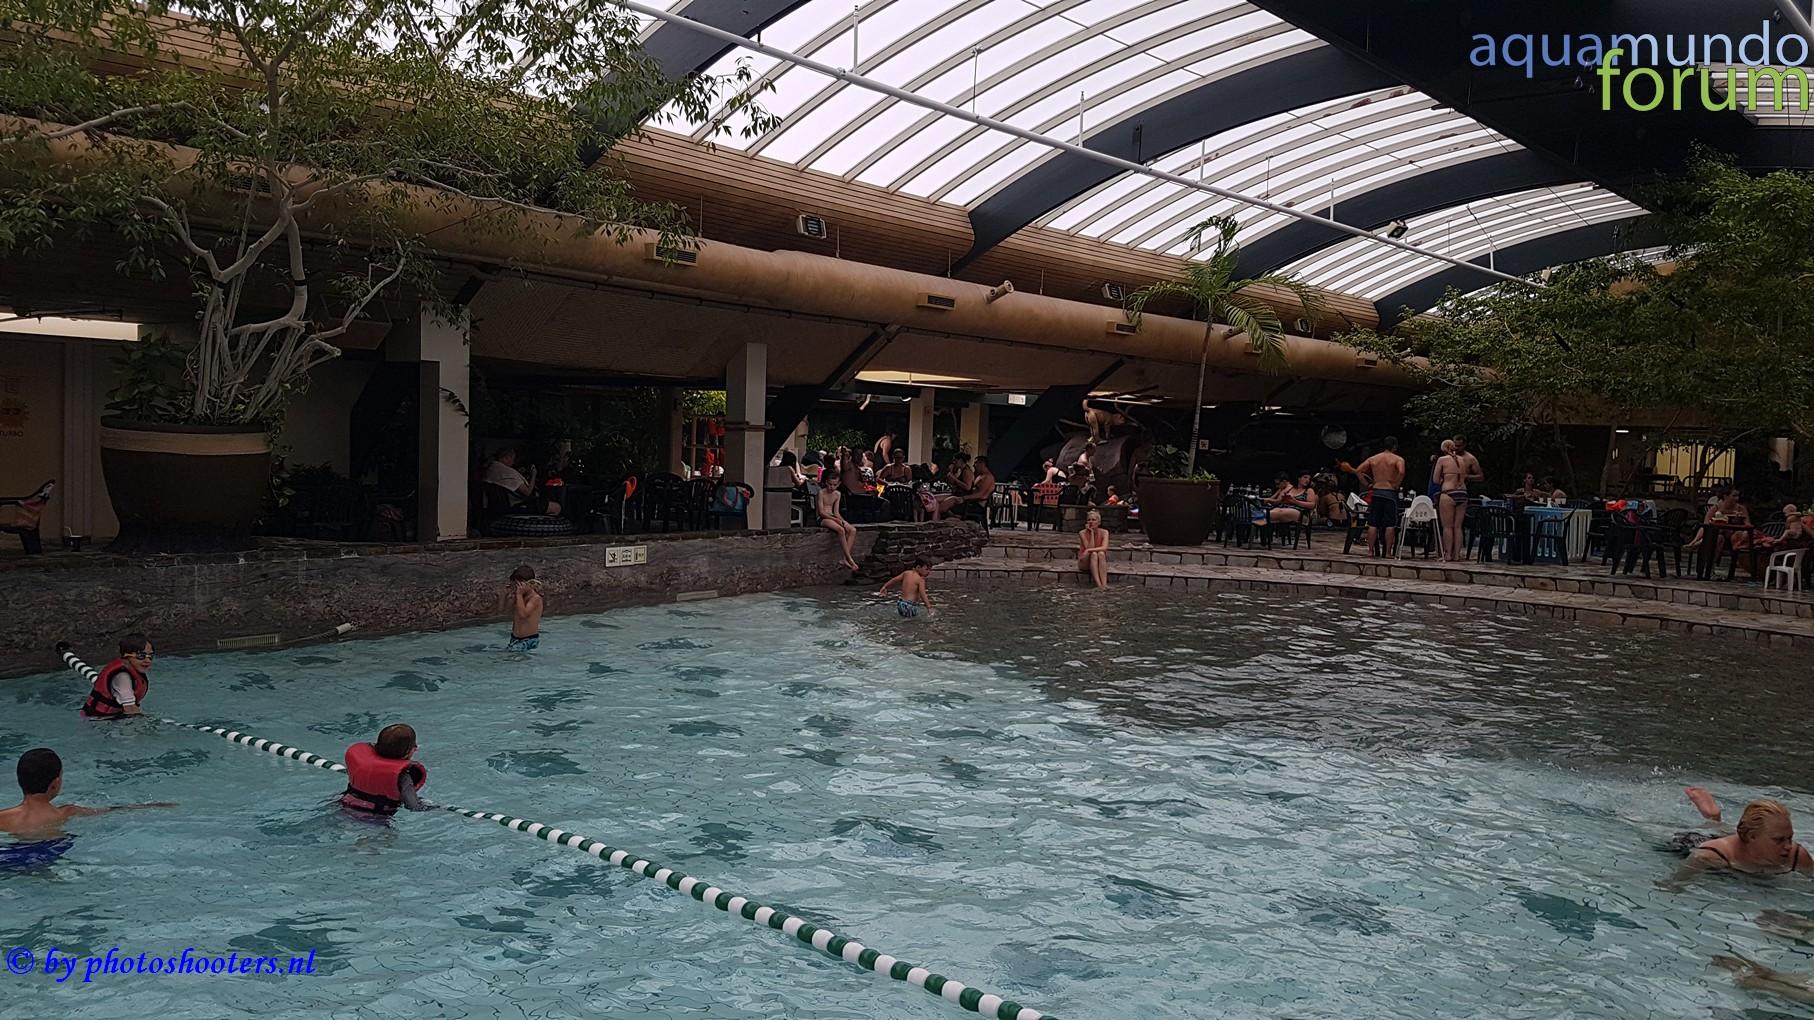 Aqua Mundo Center Parcs Het Meerdal (19).jpg